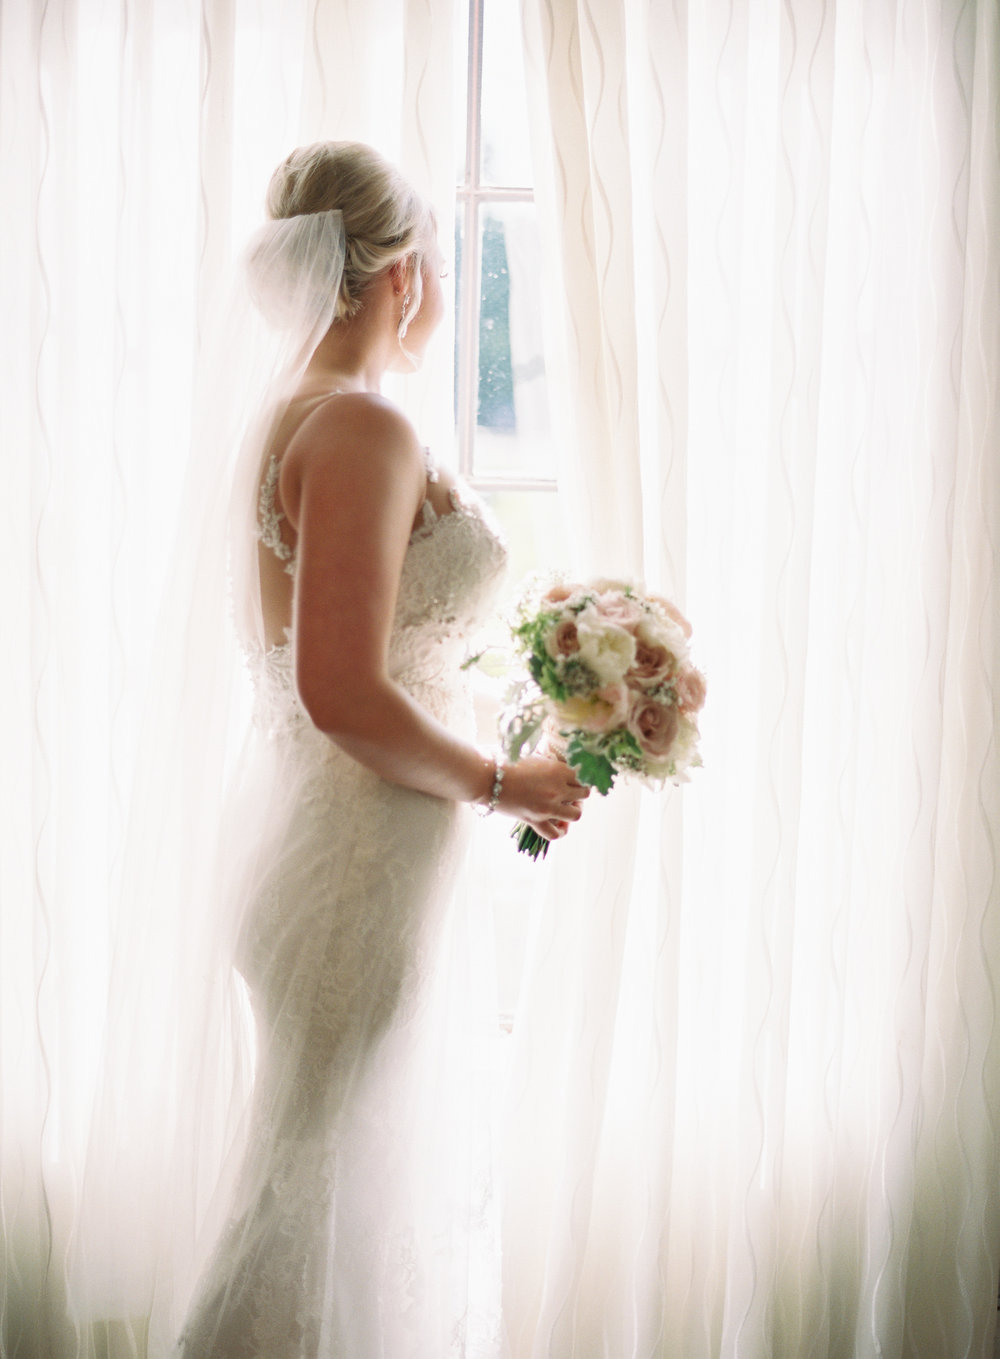 SLYPhoto - Karah & Brett Wedding-004-7.jpg